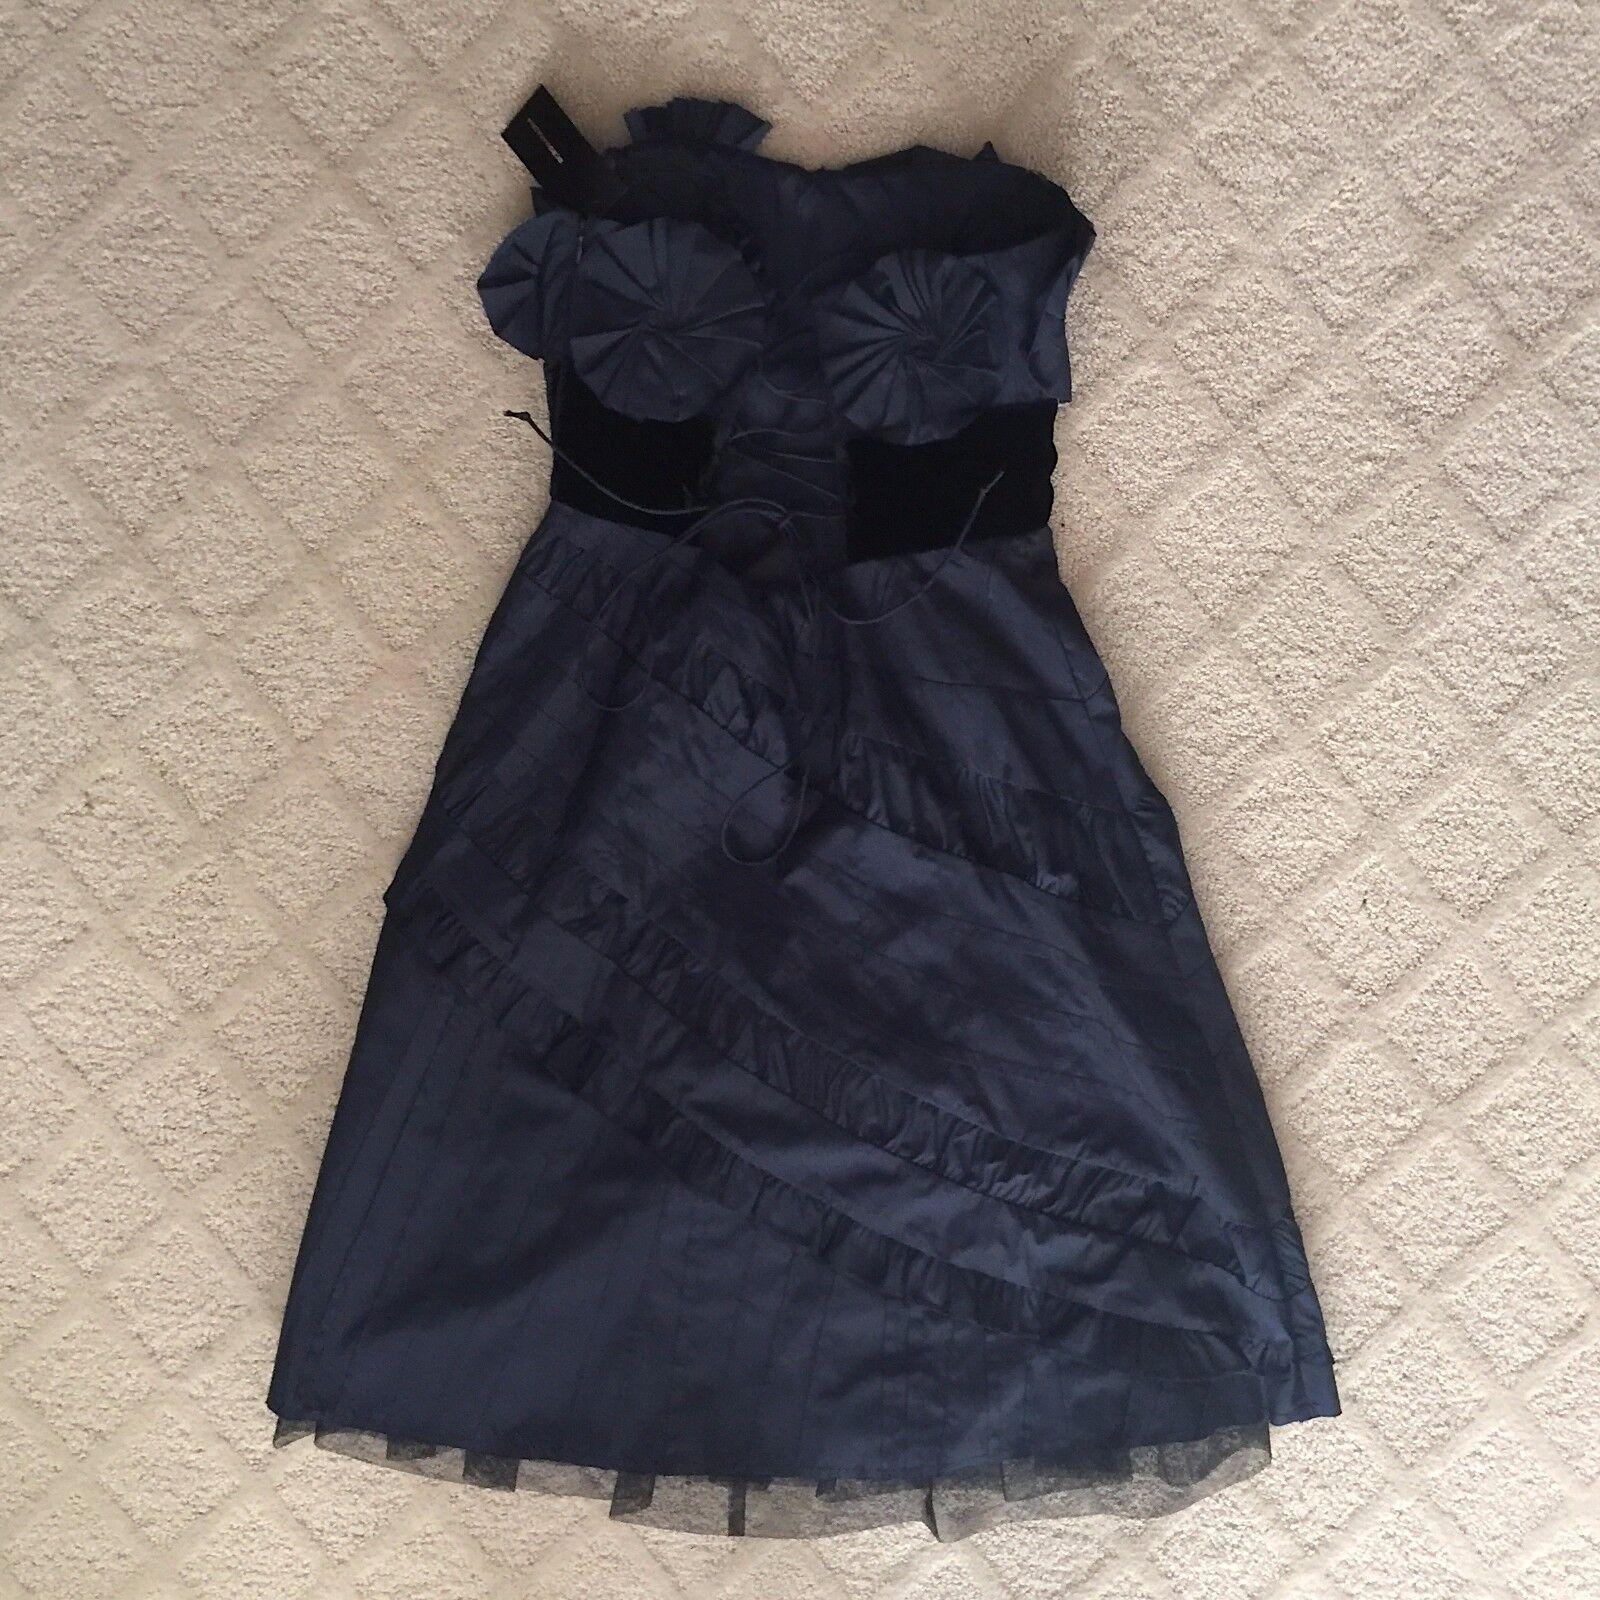 62d54c46fac75 ... NWT BCBG BCBG BCBG bluee Strapless Dress with Taffeta c1ffd1 ...